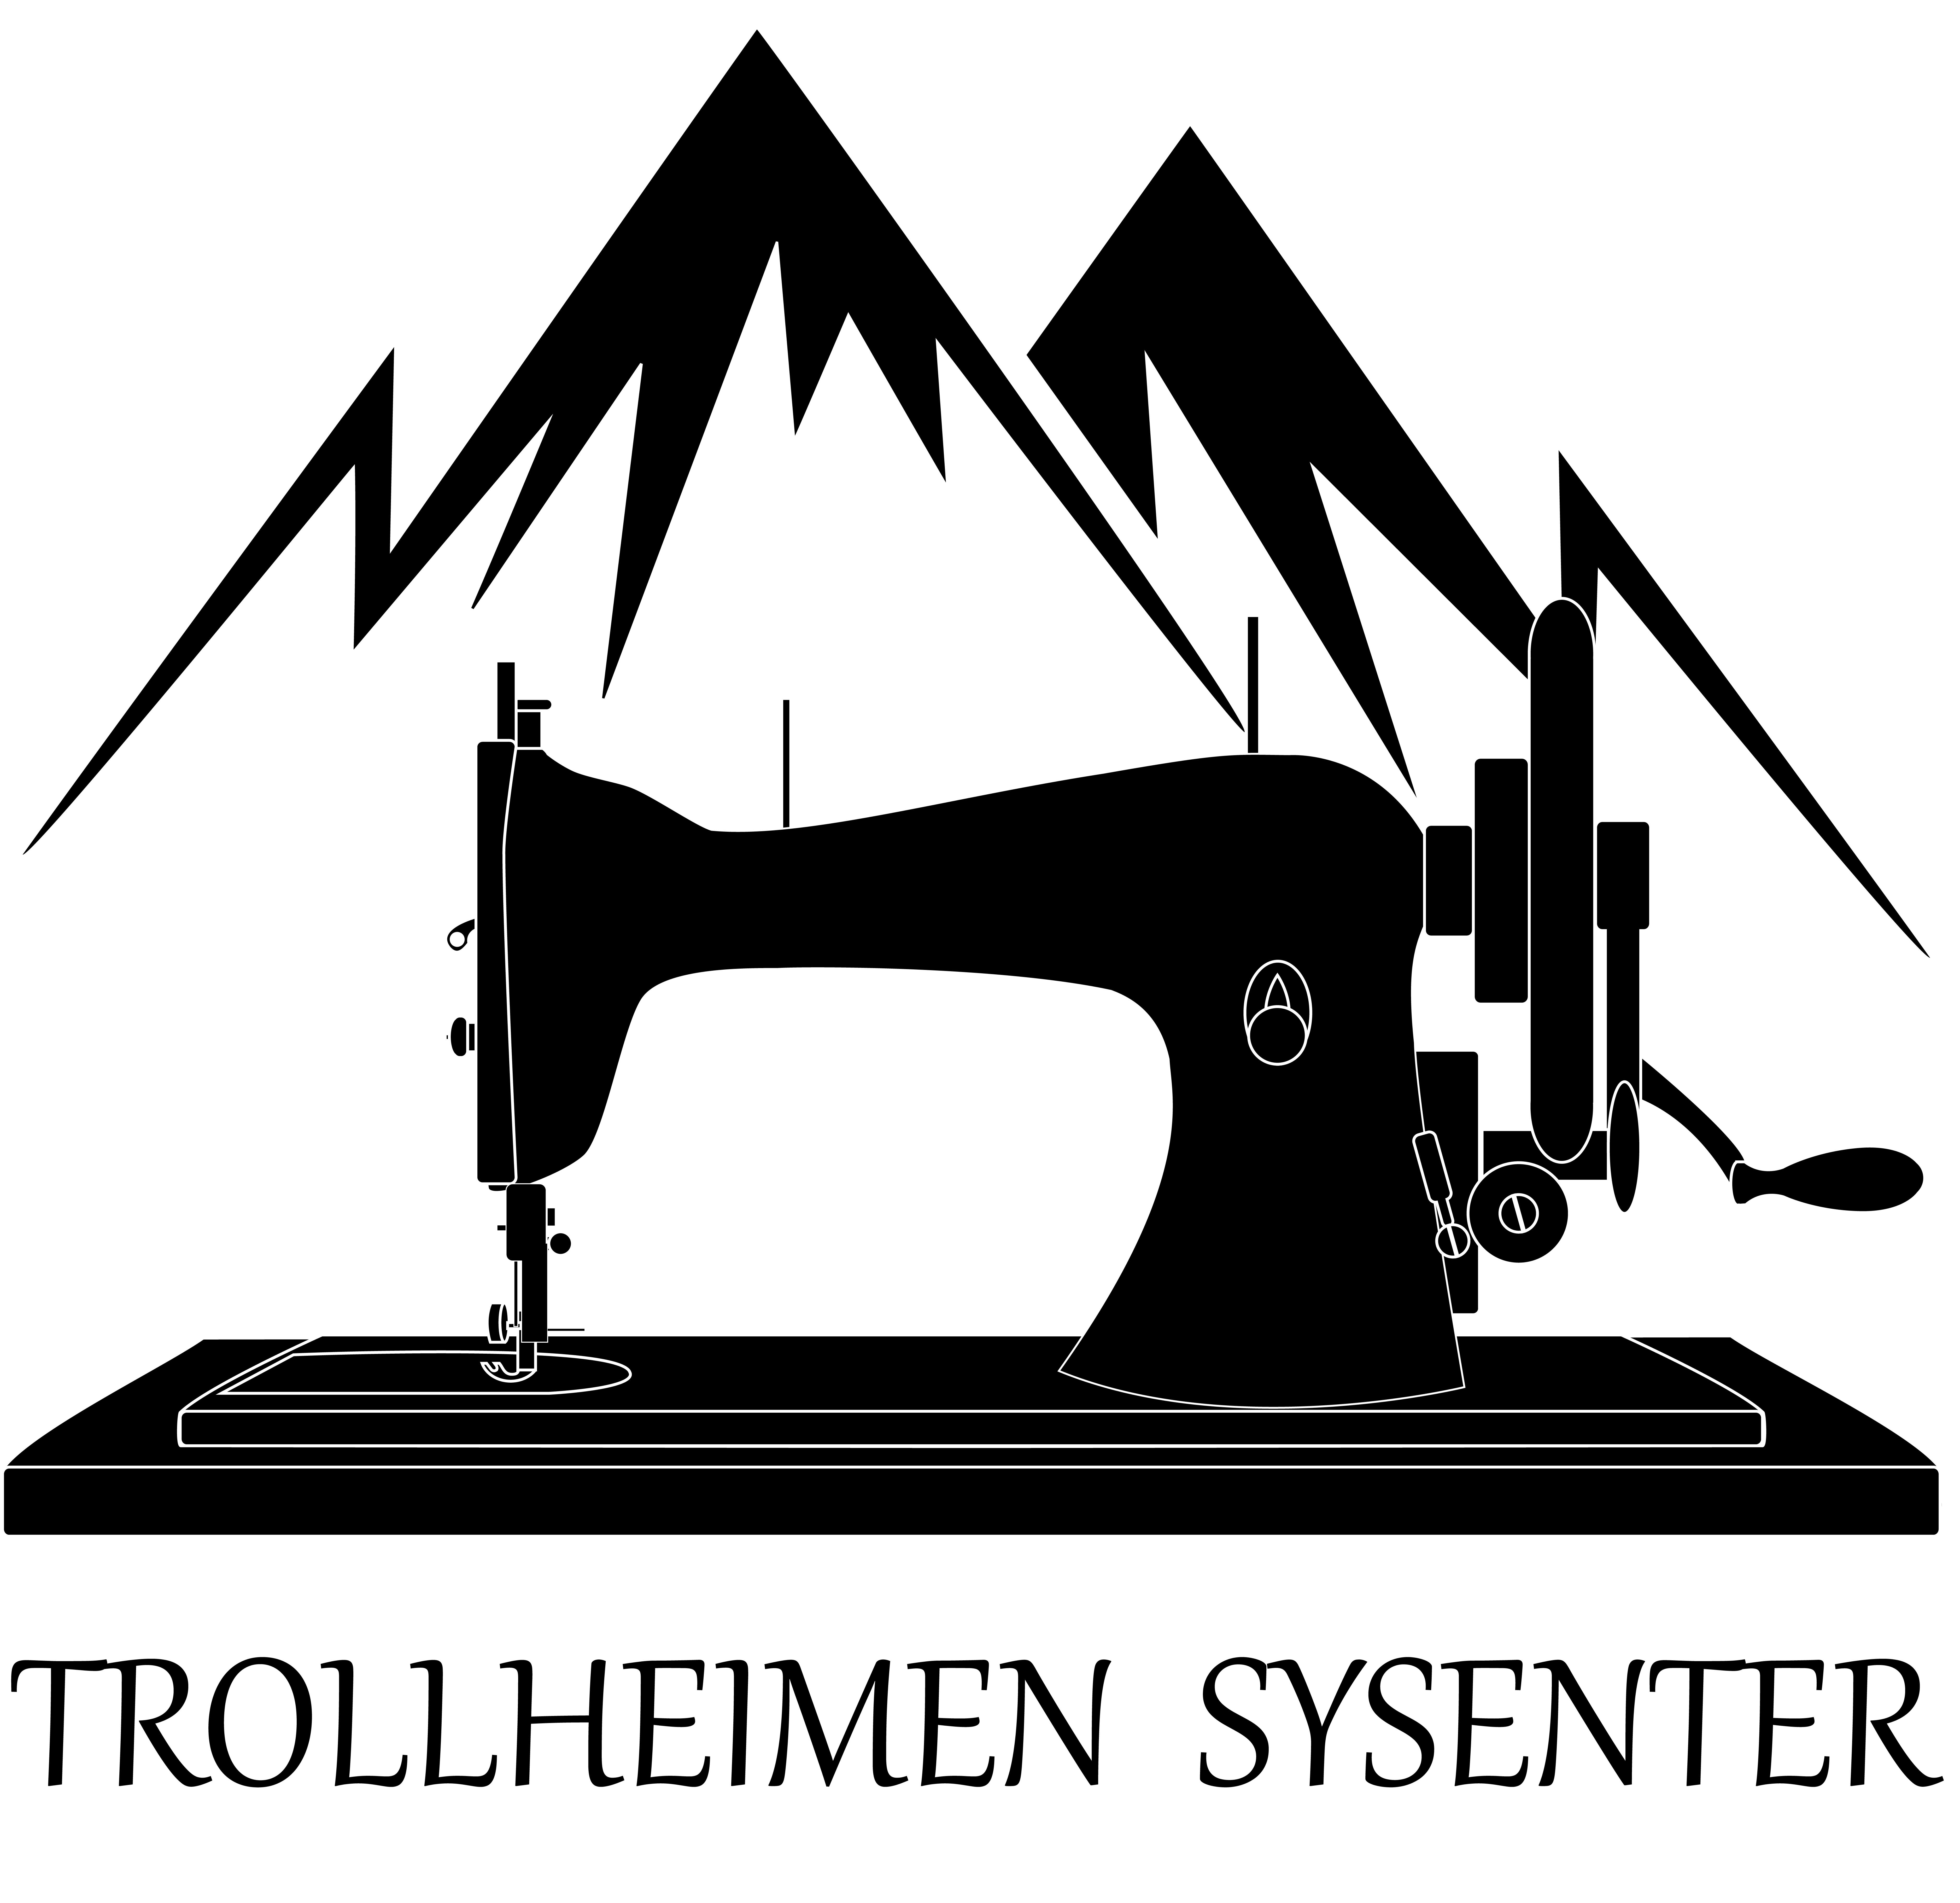 Trollheimen sysenter